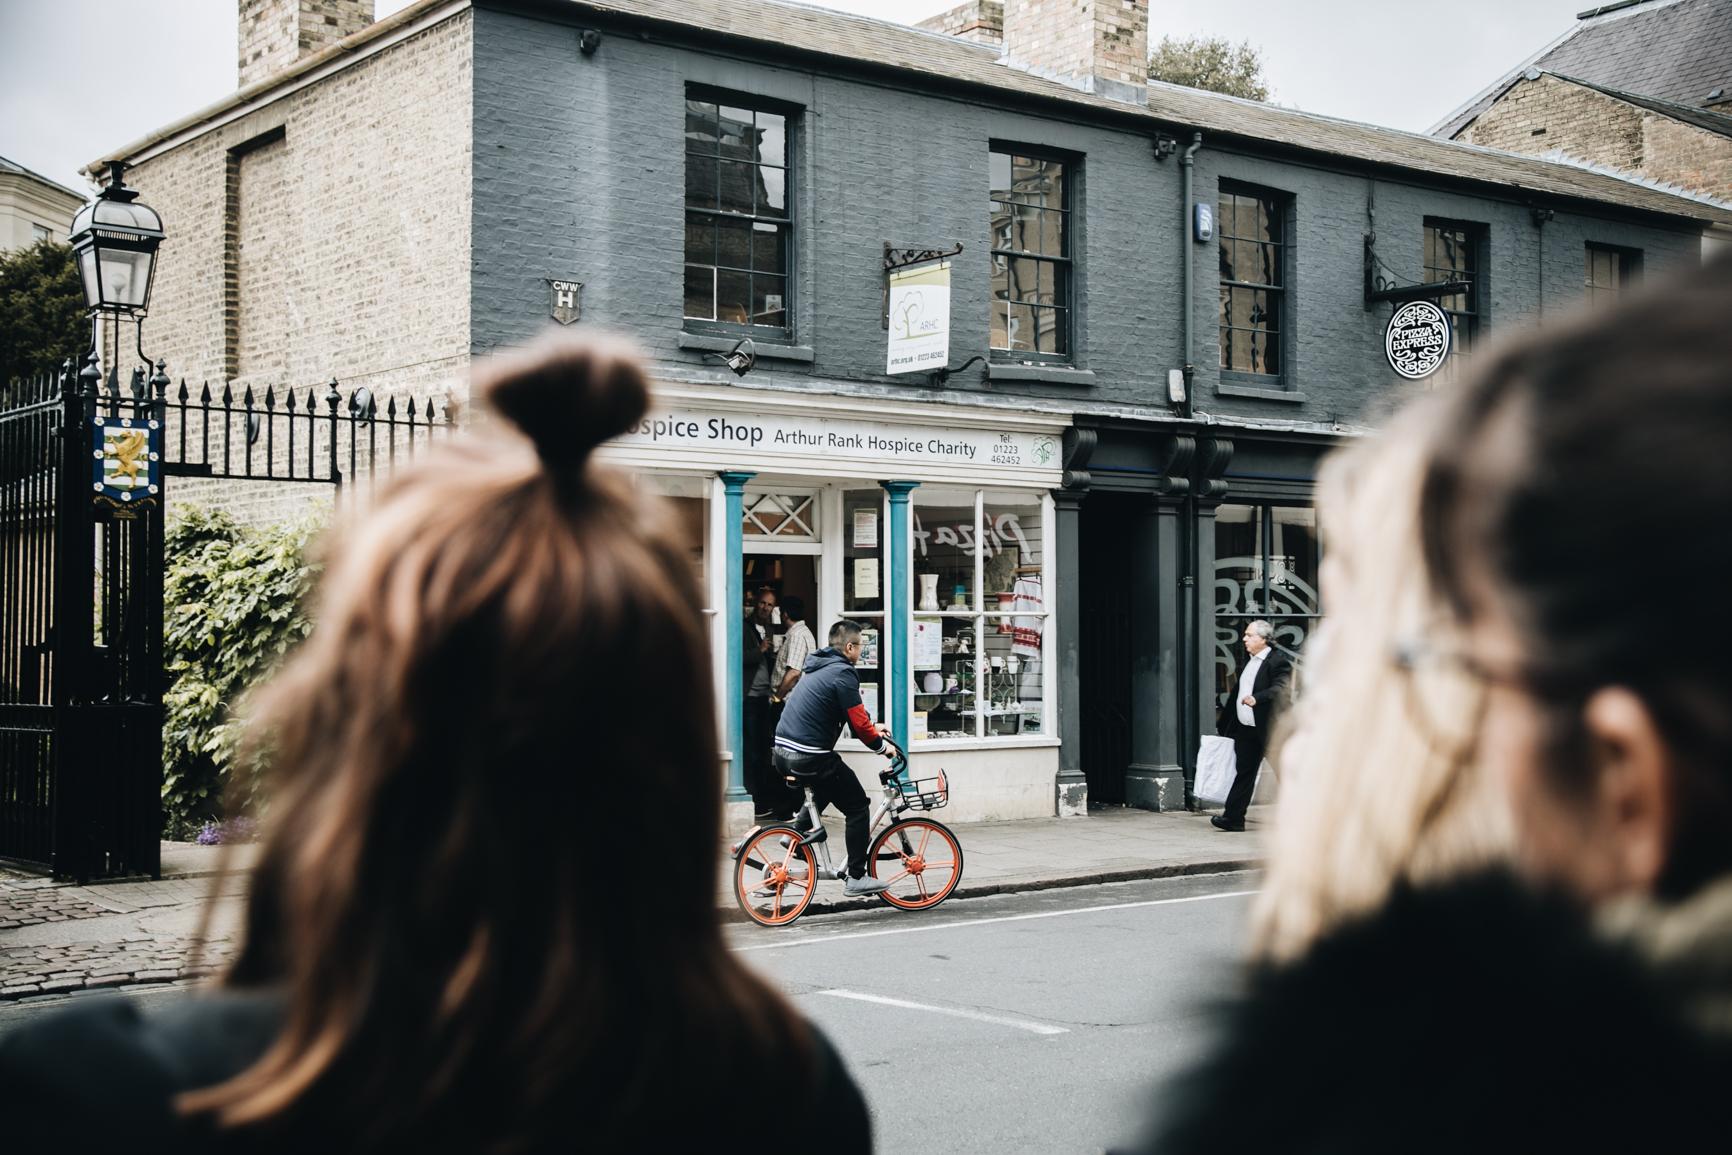 Visit-cambridge-travel-blog-onmyway.jpg